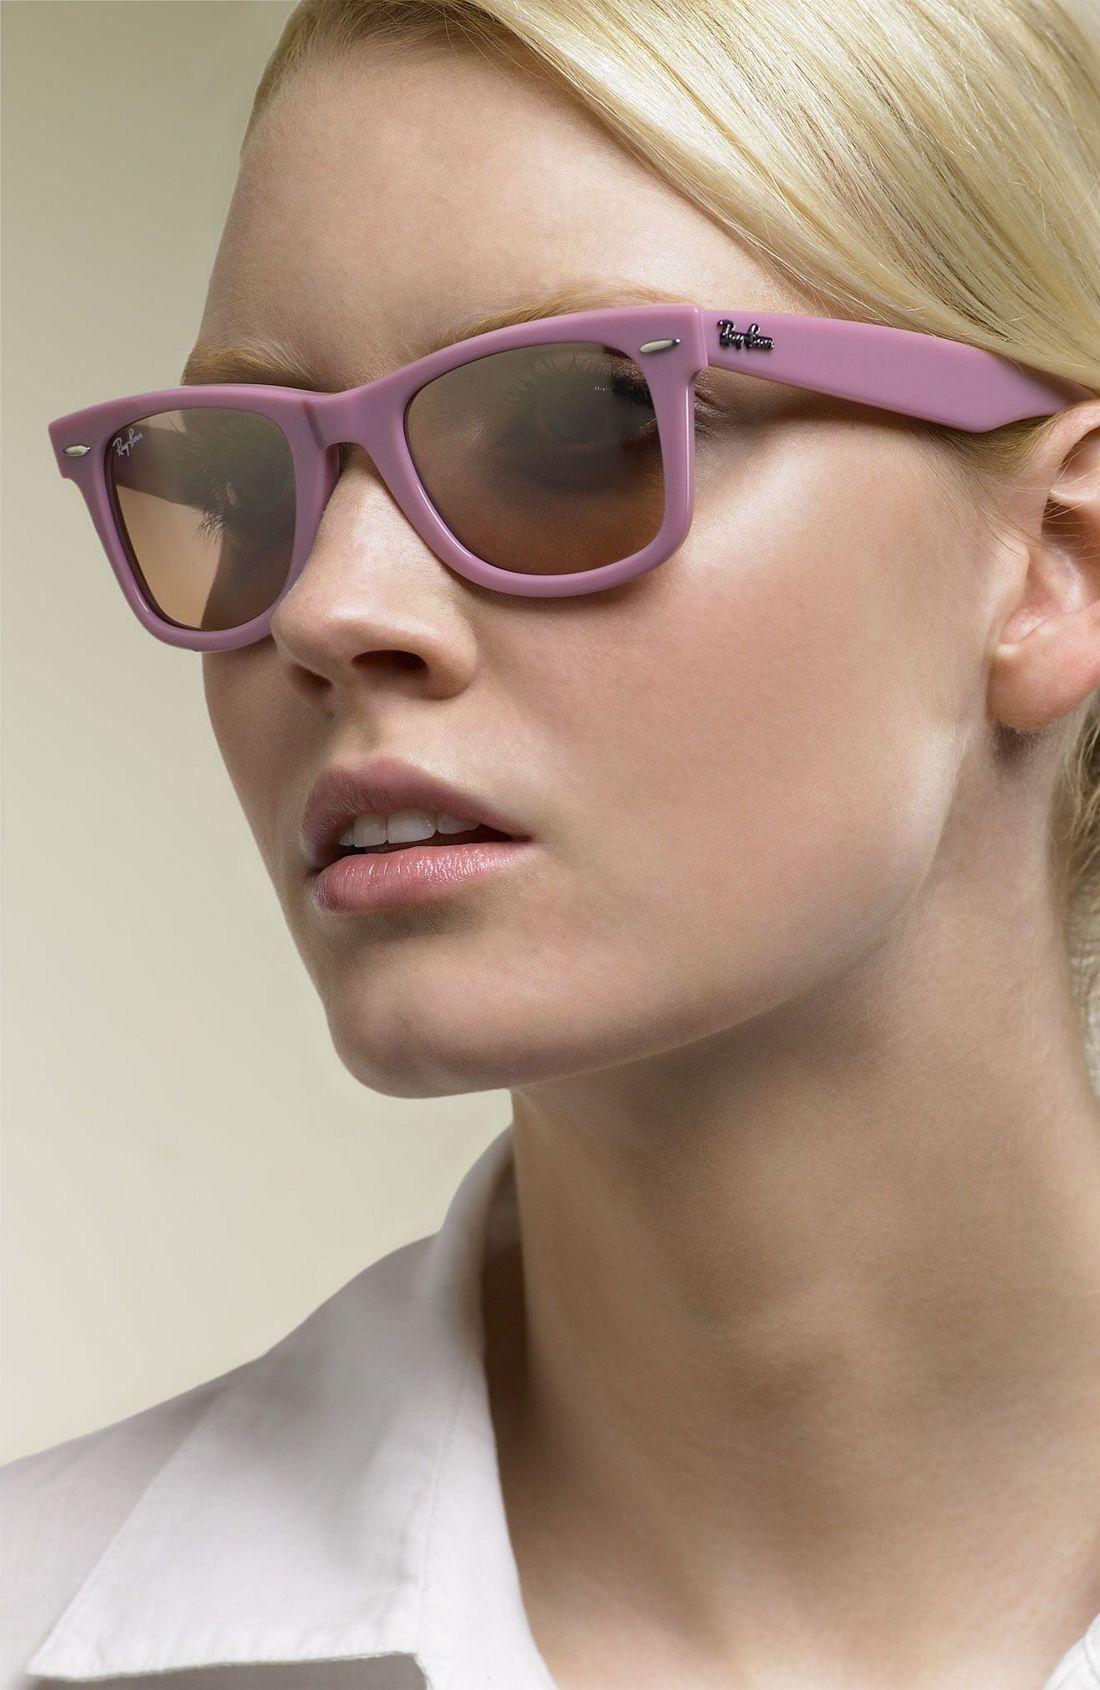 ray ban wayfarer 50mm polarized  ray ban classic wayfarer 50mm polarized sunglasses